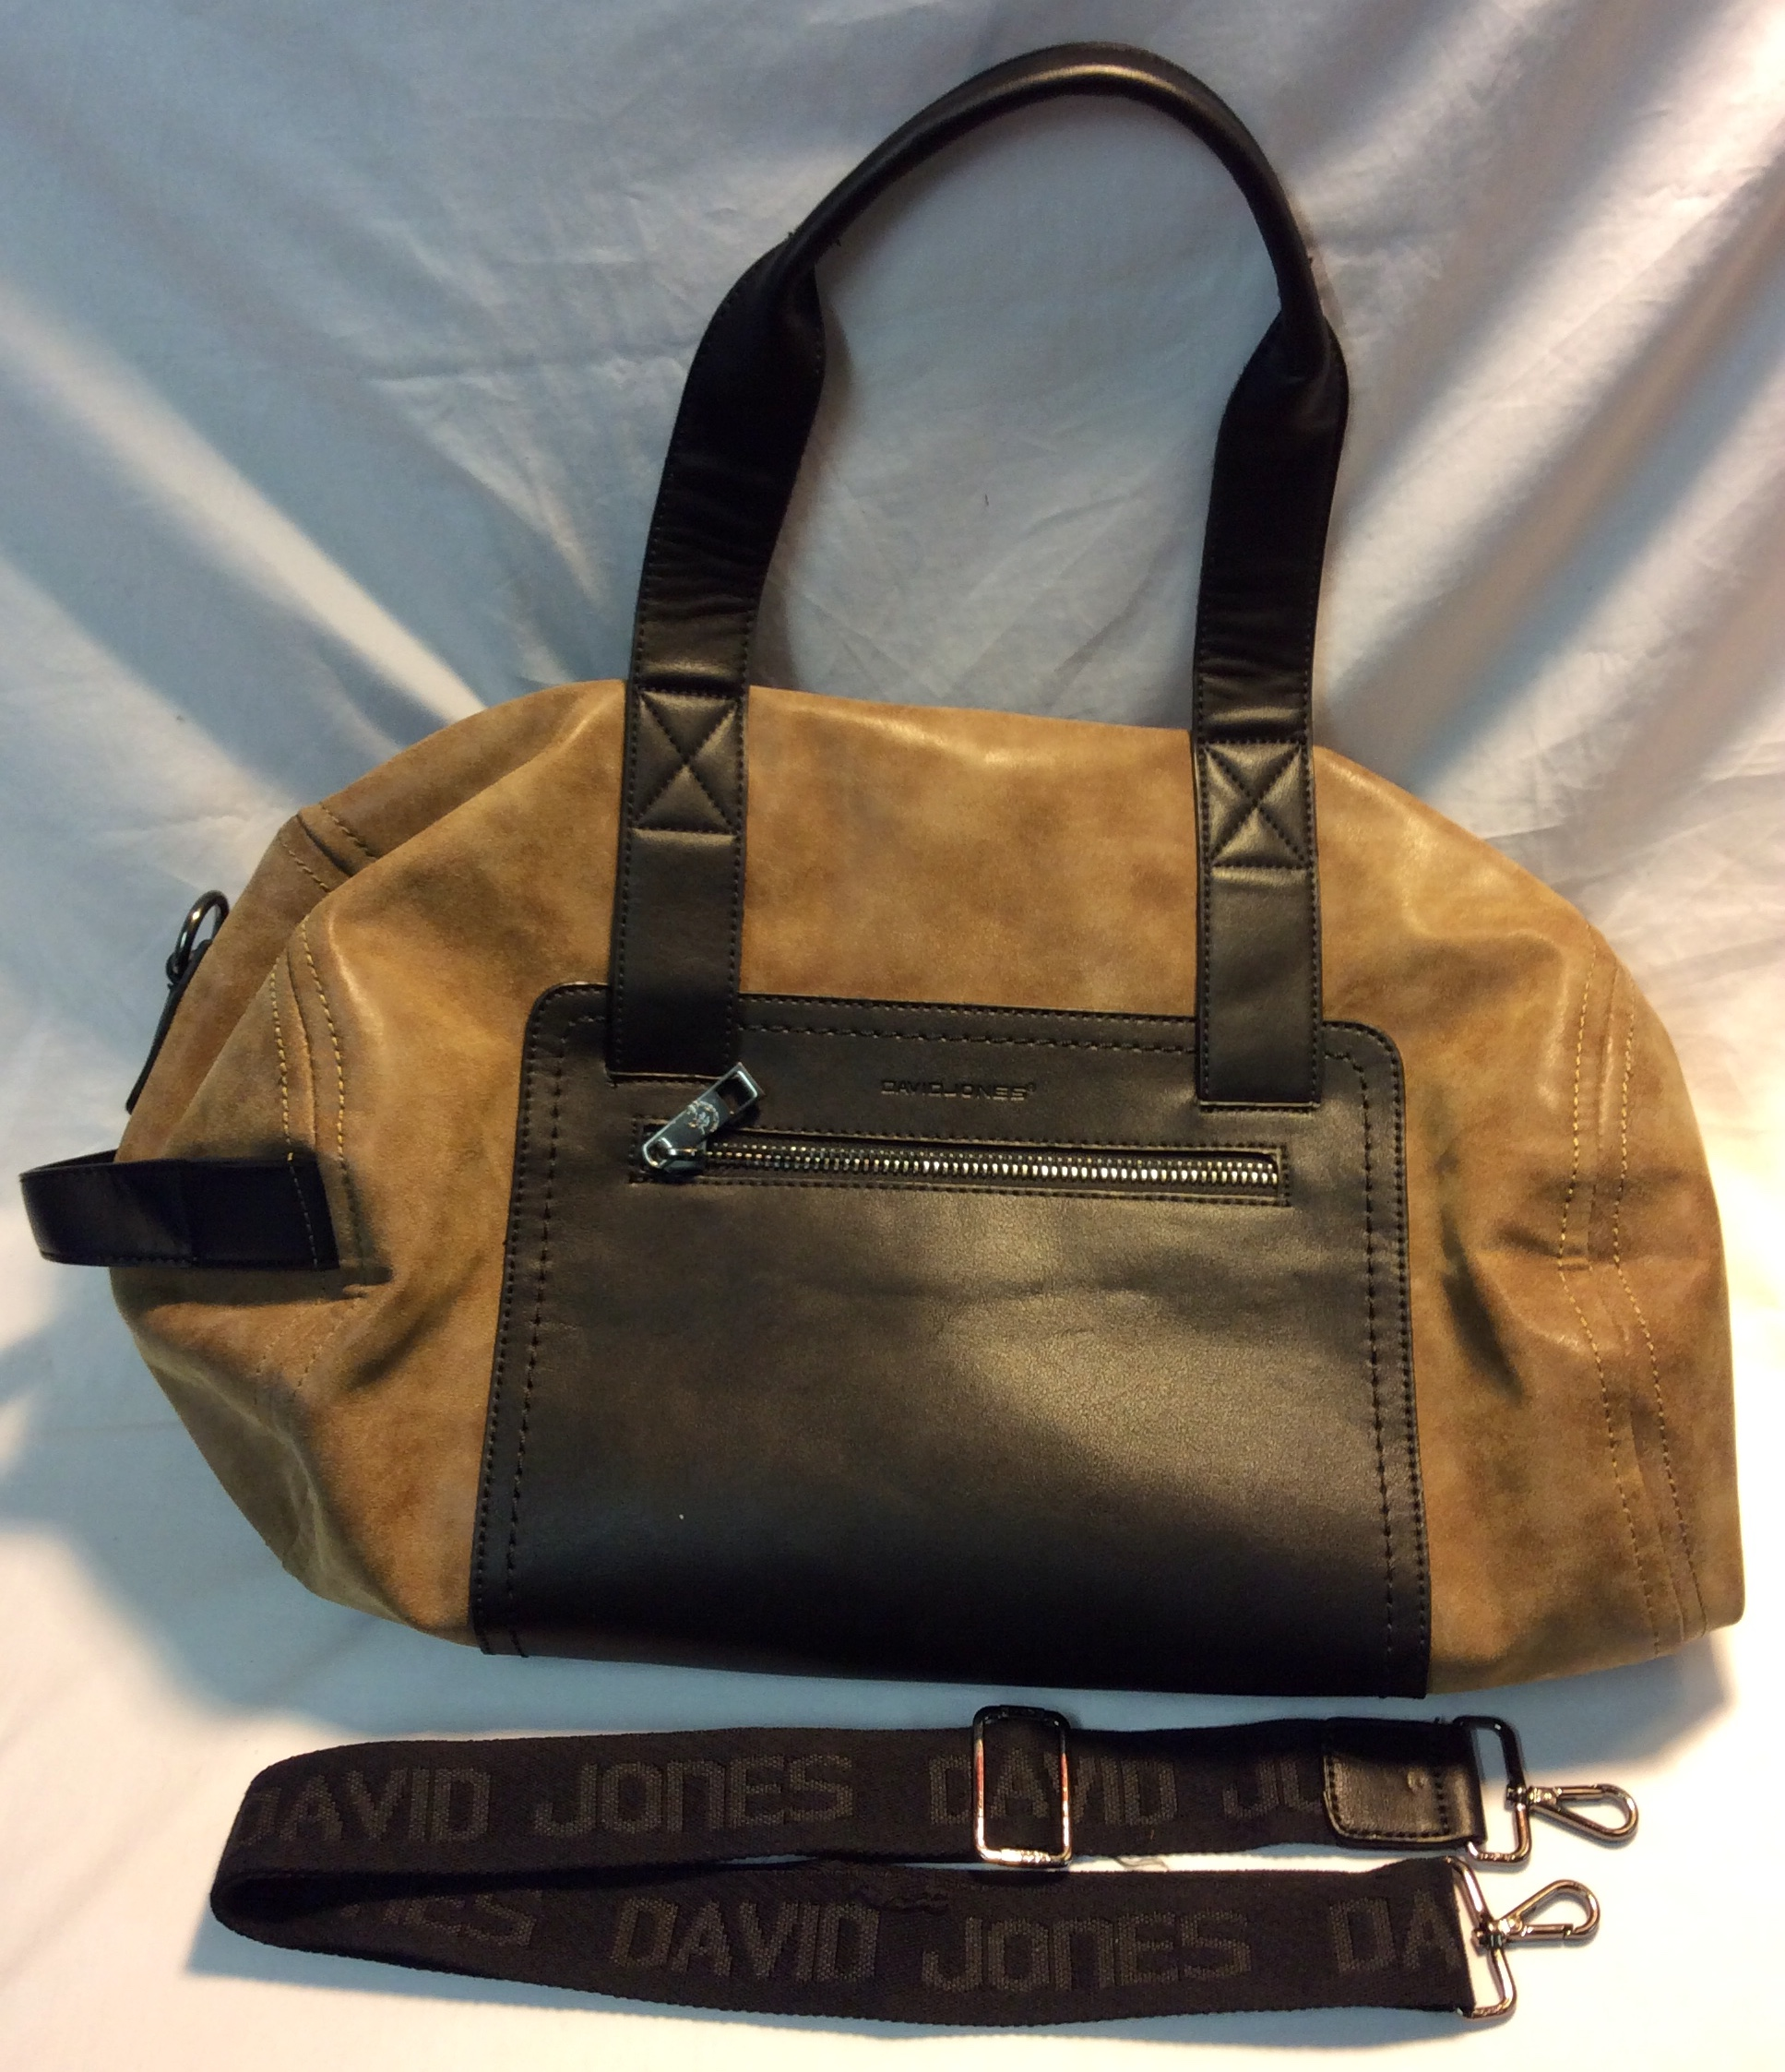 Light brown and black leather bag